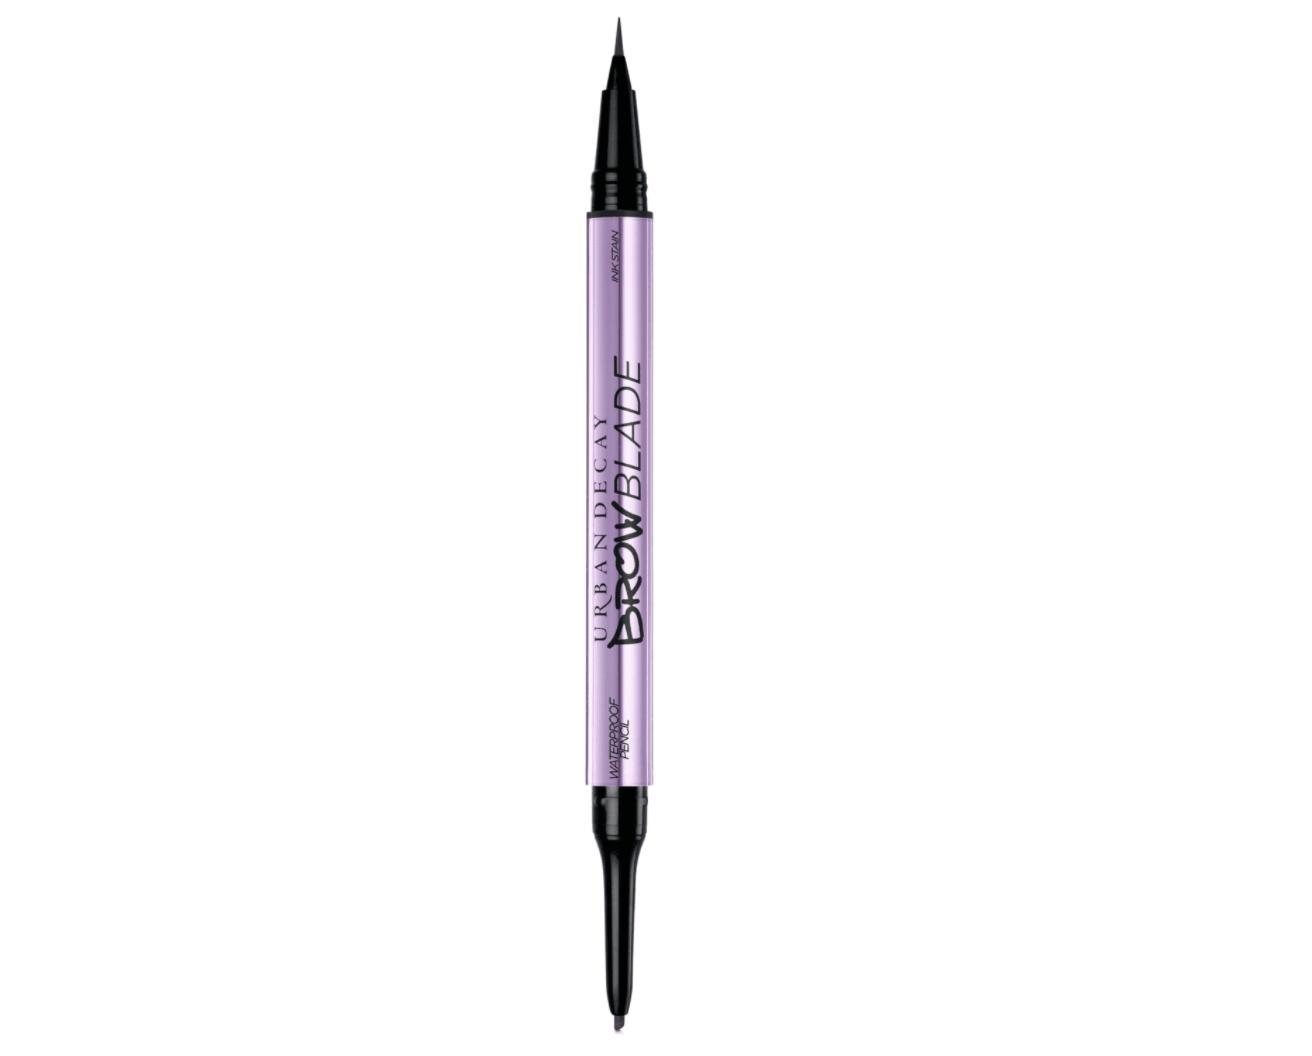 Urban Decay Brow Blade Waterproof Eyebrow Pencil & Ink ...